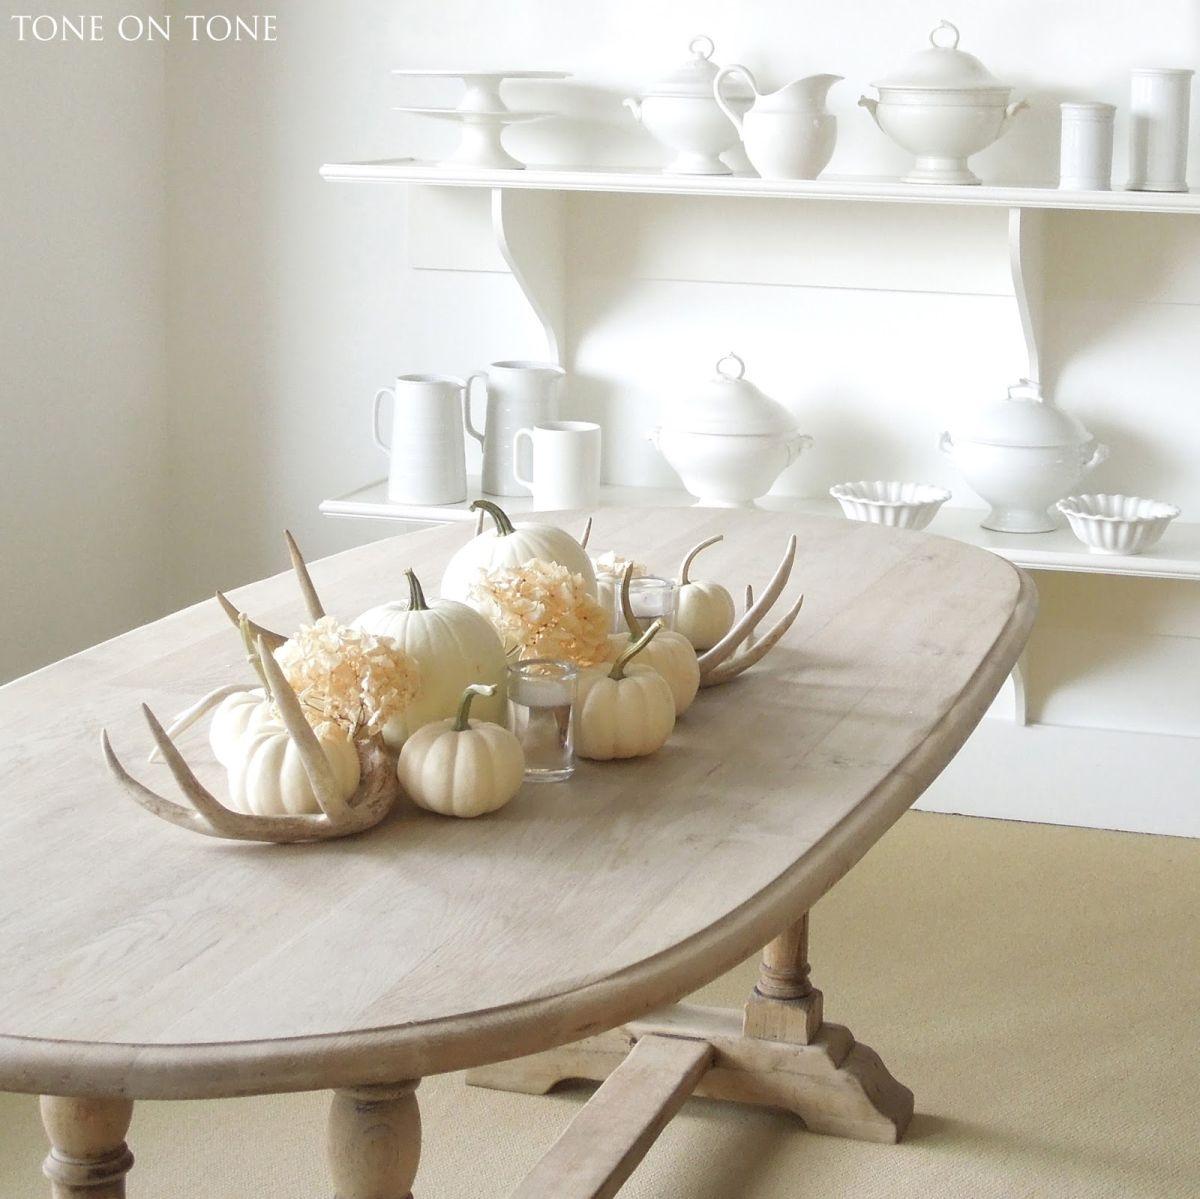 Pumpkin and Antler Table Display